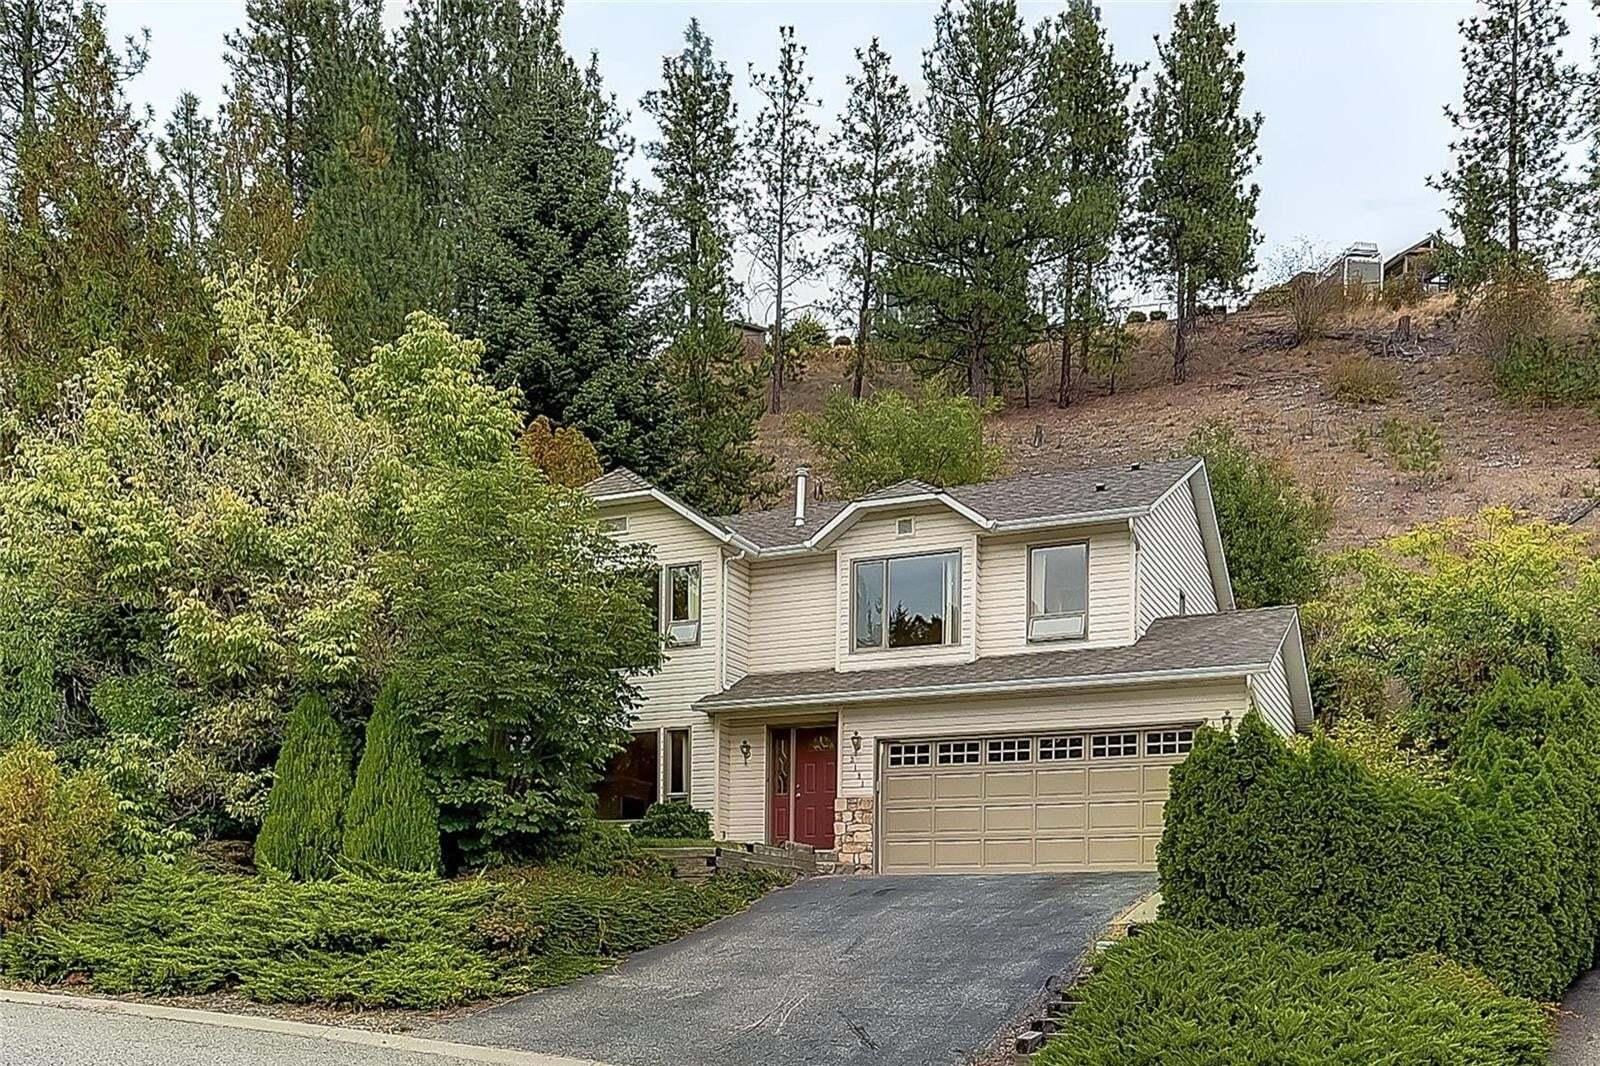 House for sale at 3191 Broadview Pl West Kelowna British Columbia - MLS: 10217225